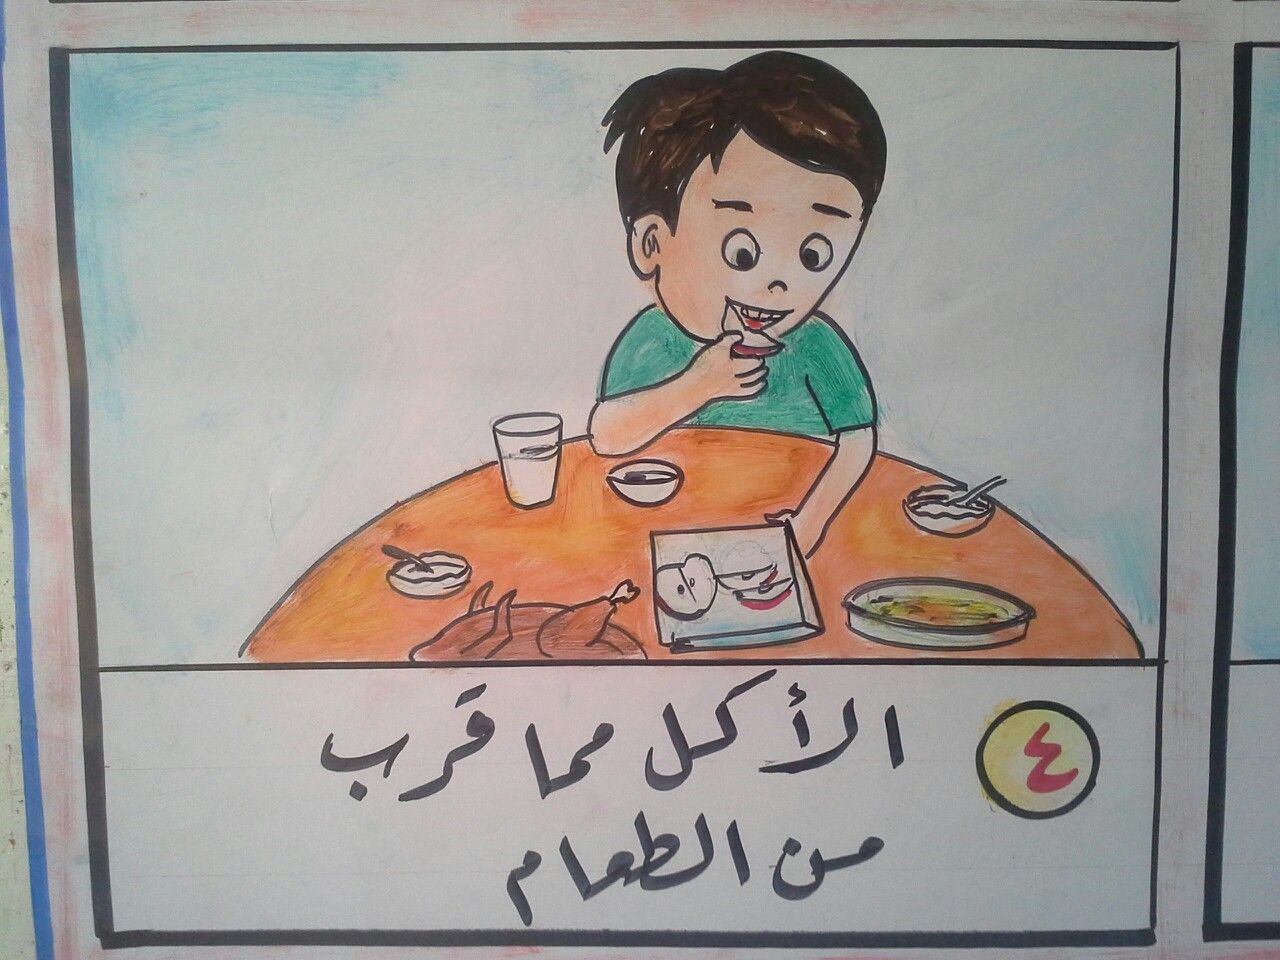 4 الاكل مما قرب من الطعام Islamic Kids Activities Activities For Kids School Activities